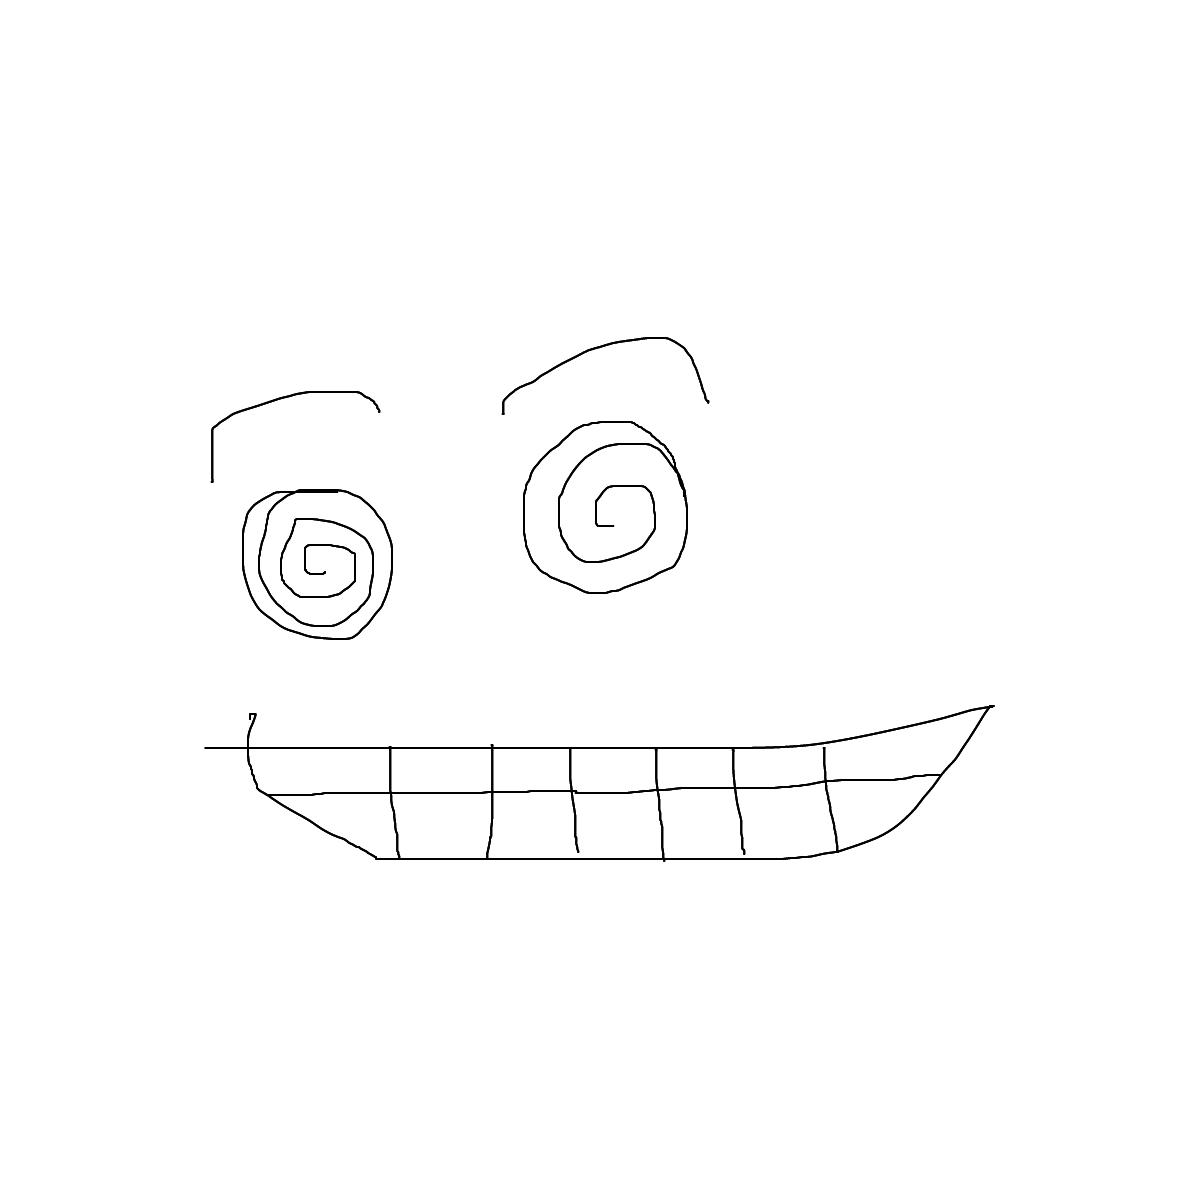 BAAAM drawing#9866 lat:43.6472396850585940lng: -79.3925857543945300